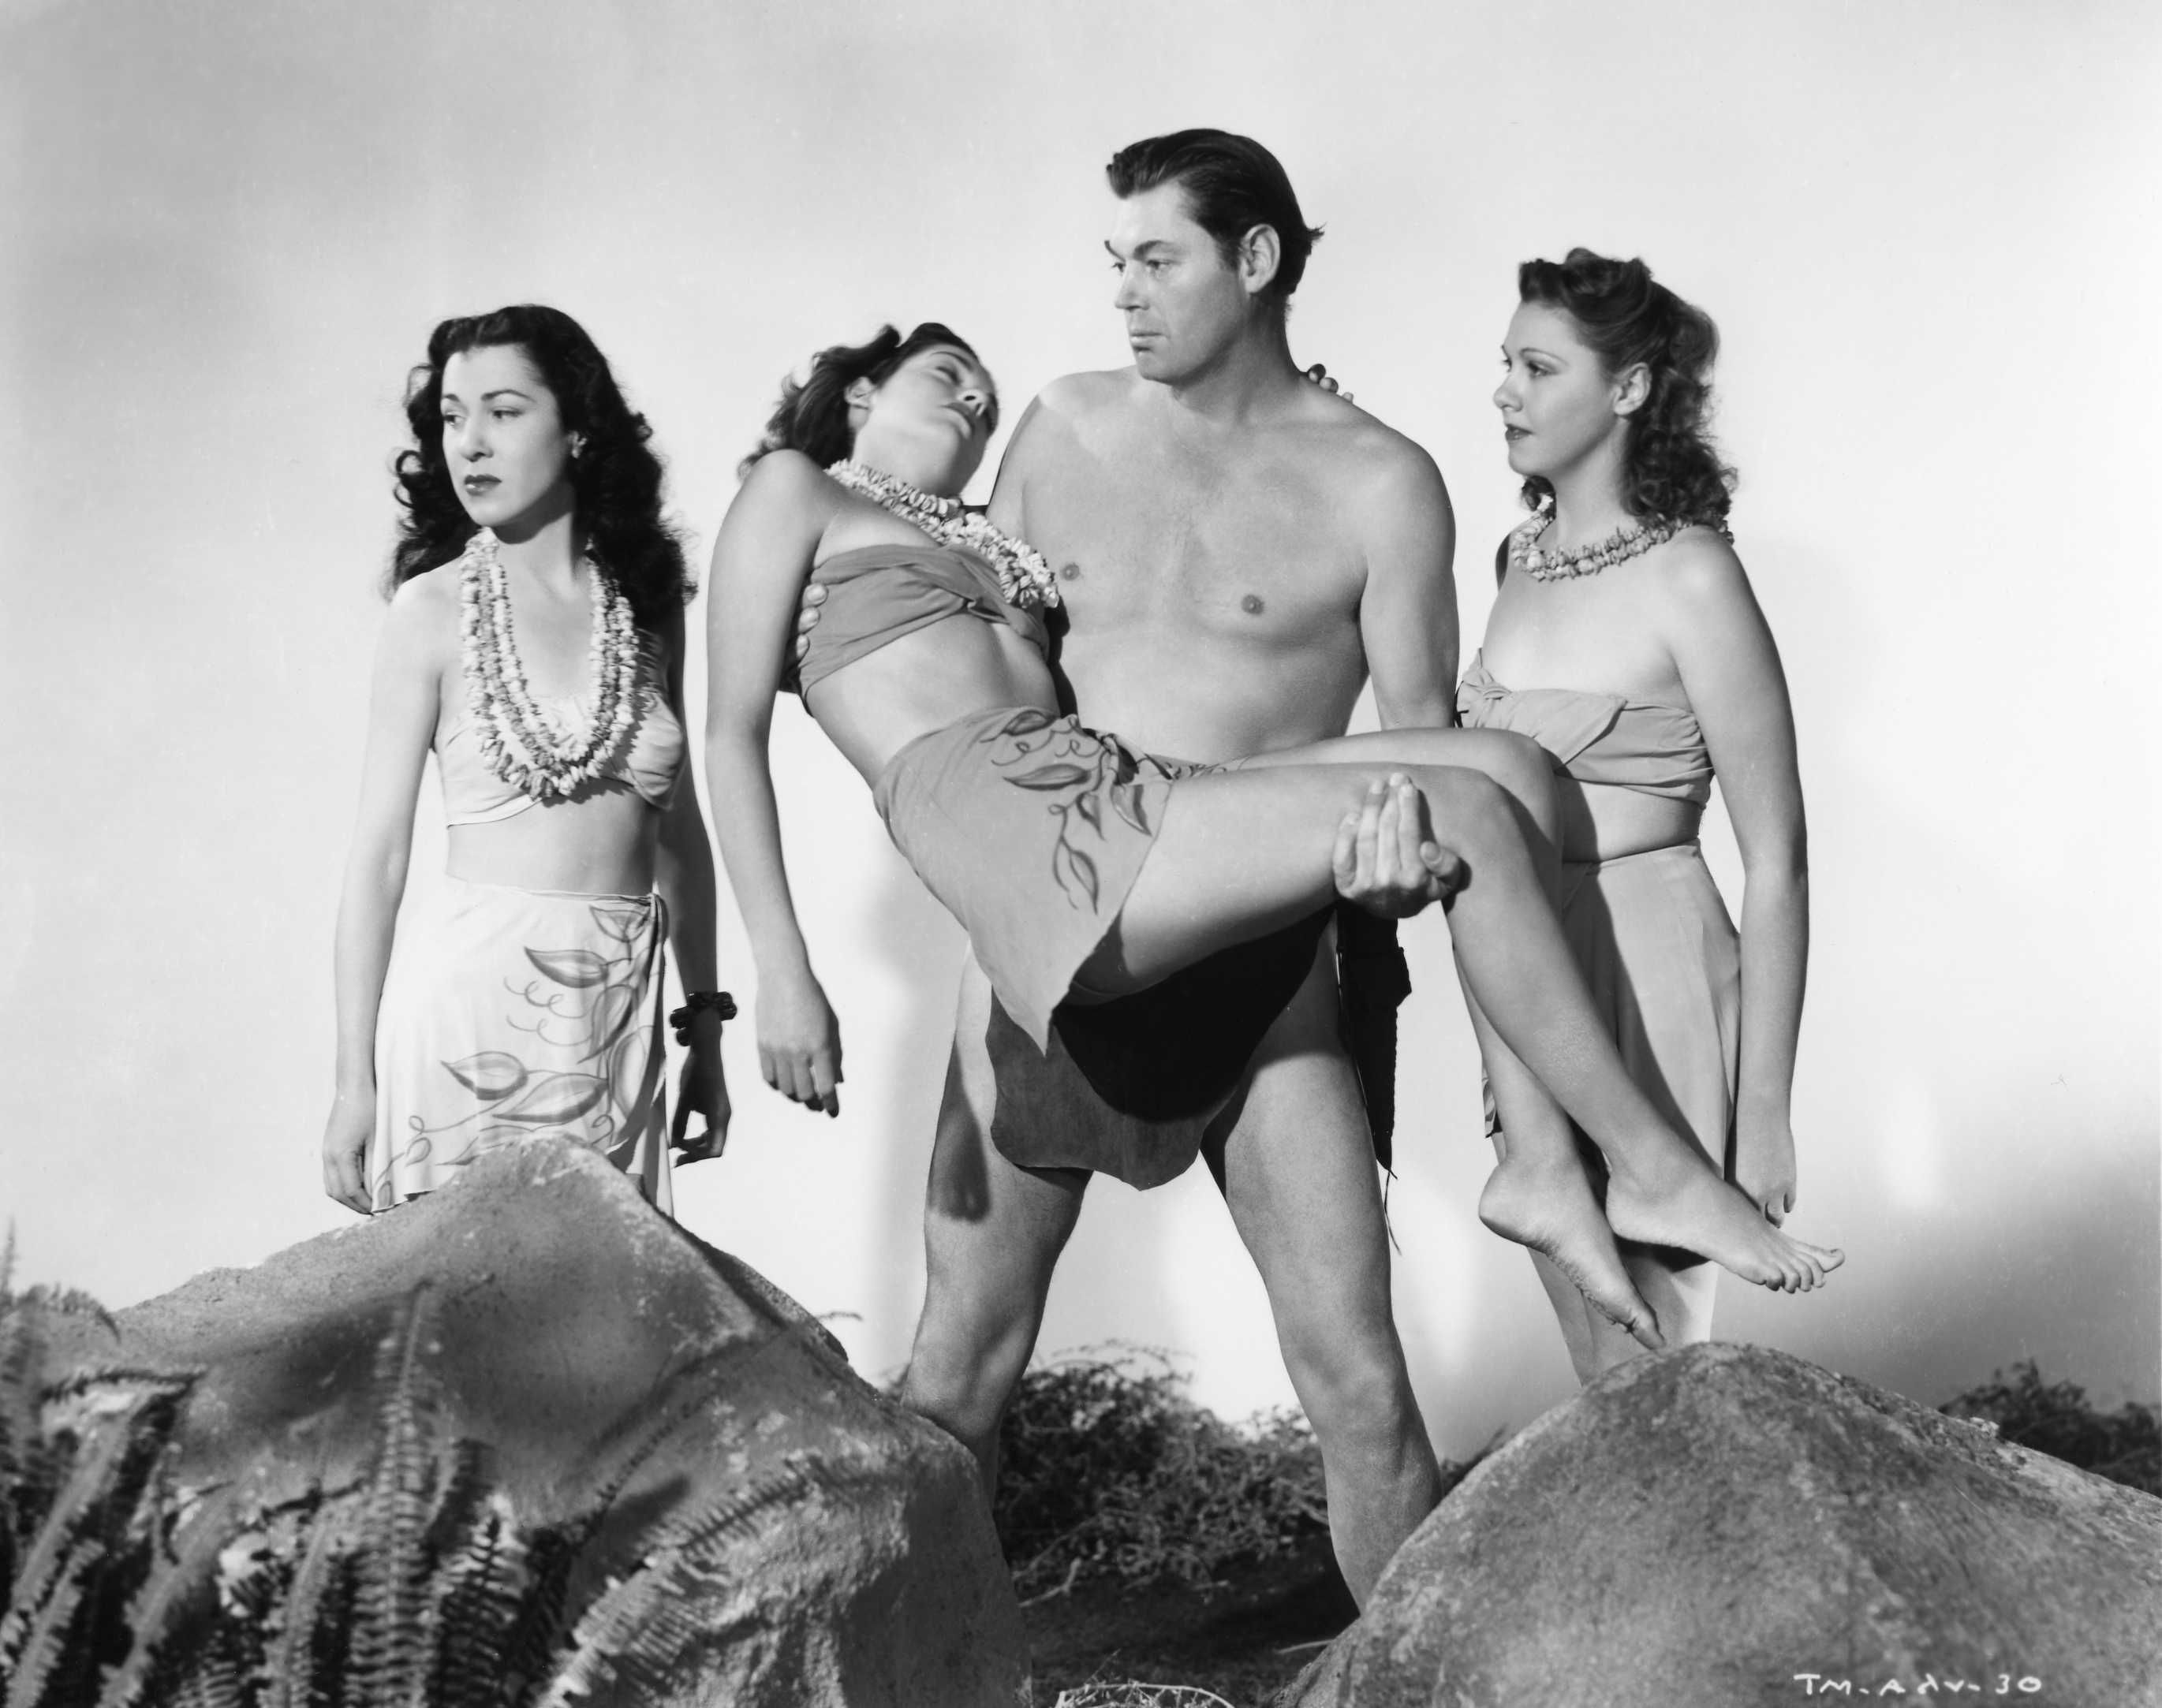 Resultado de imagem para Tarzan and the Mermaids. 1948